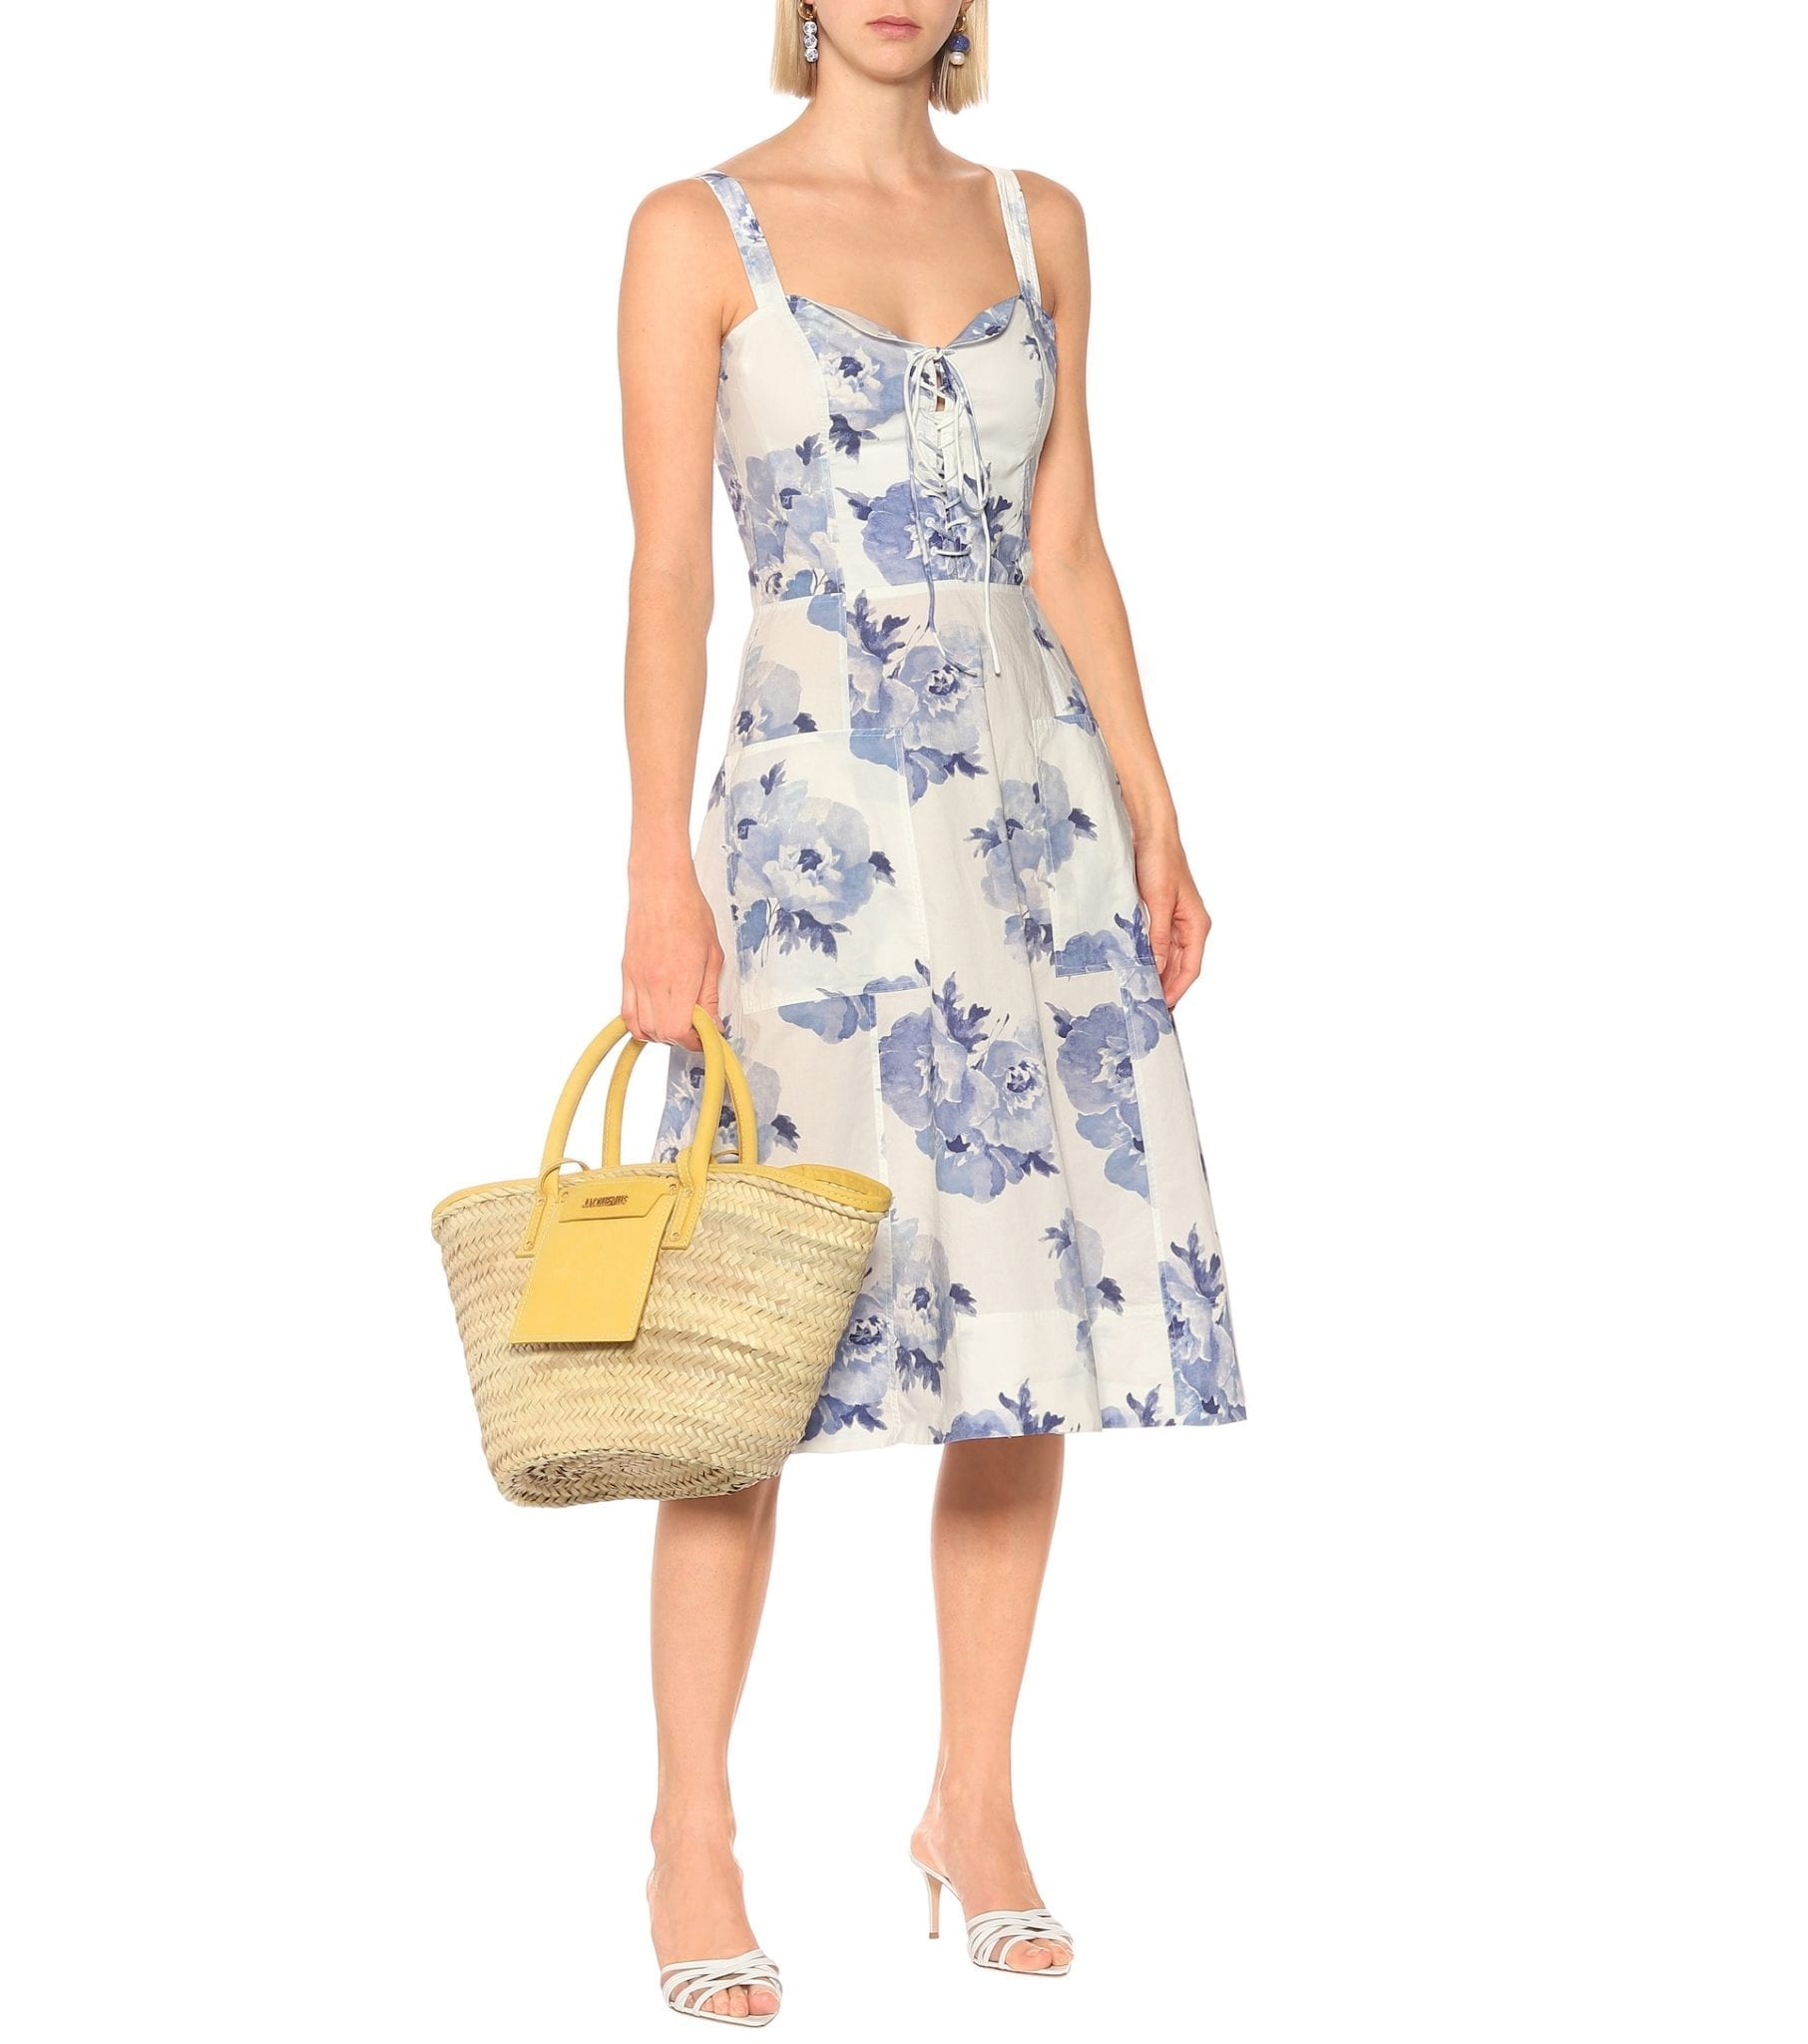 POLO RALPH LAUREN Exclusive To Mytheresa – Floral Cotton Midi Dress